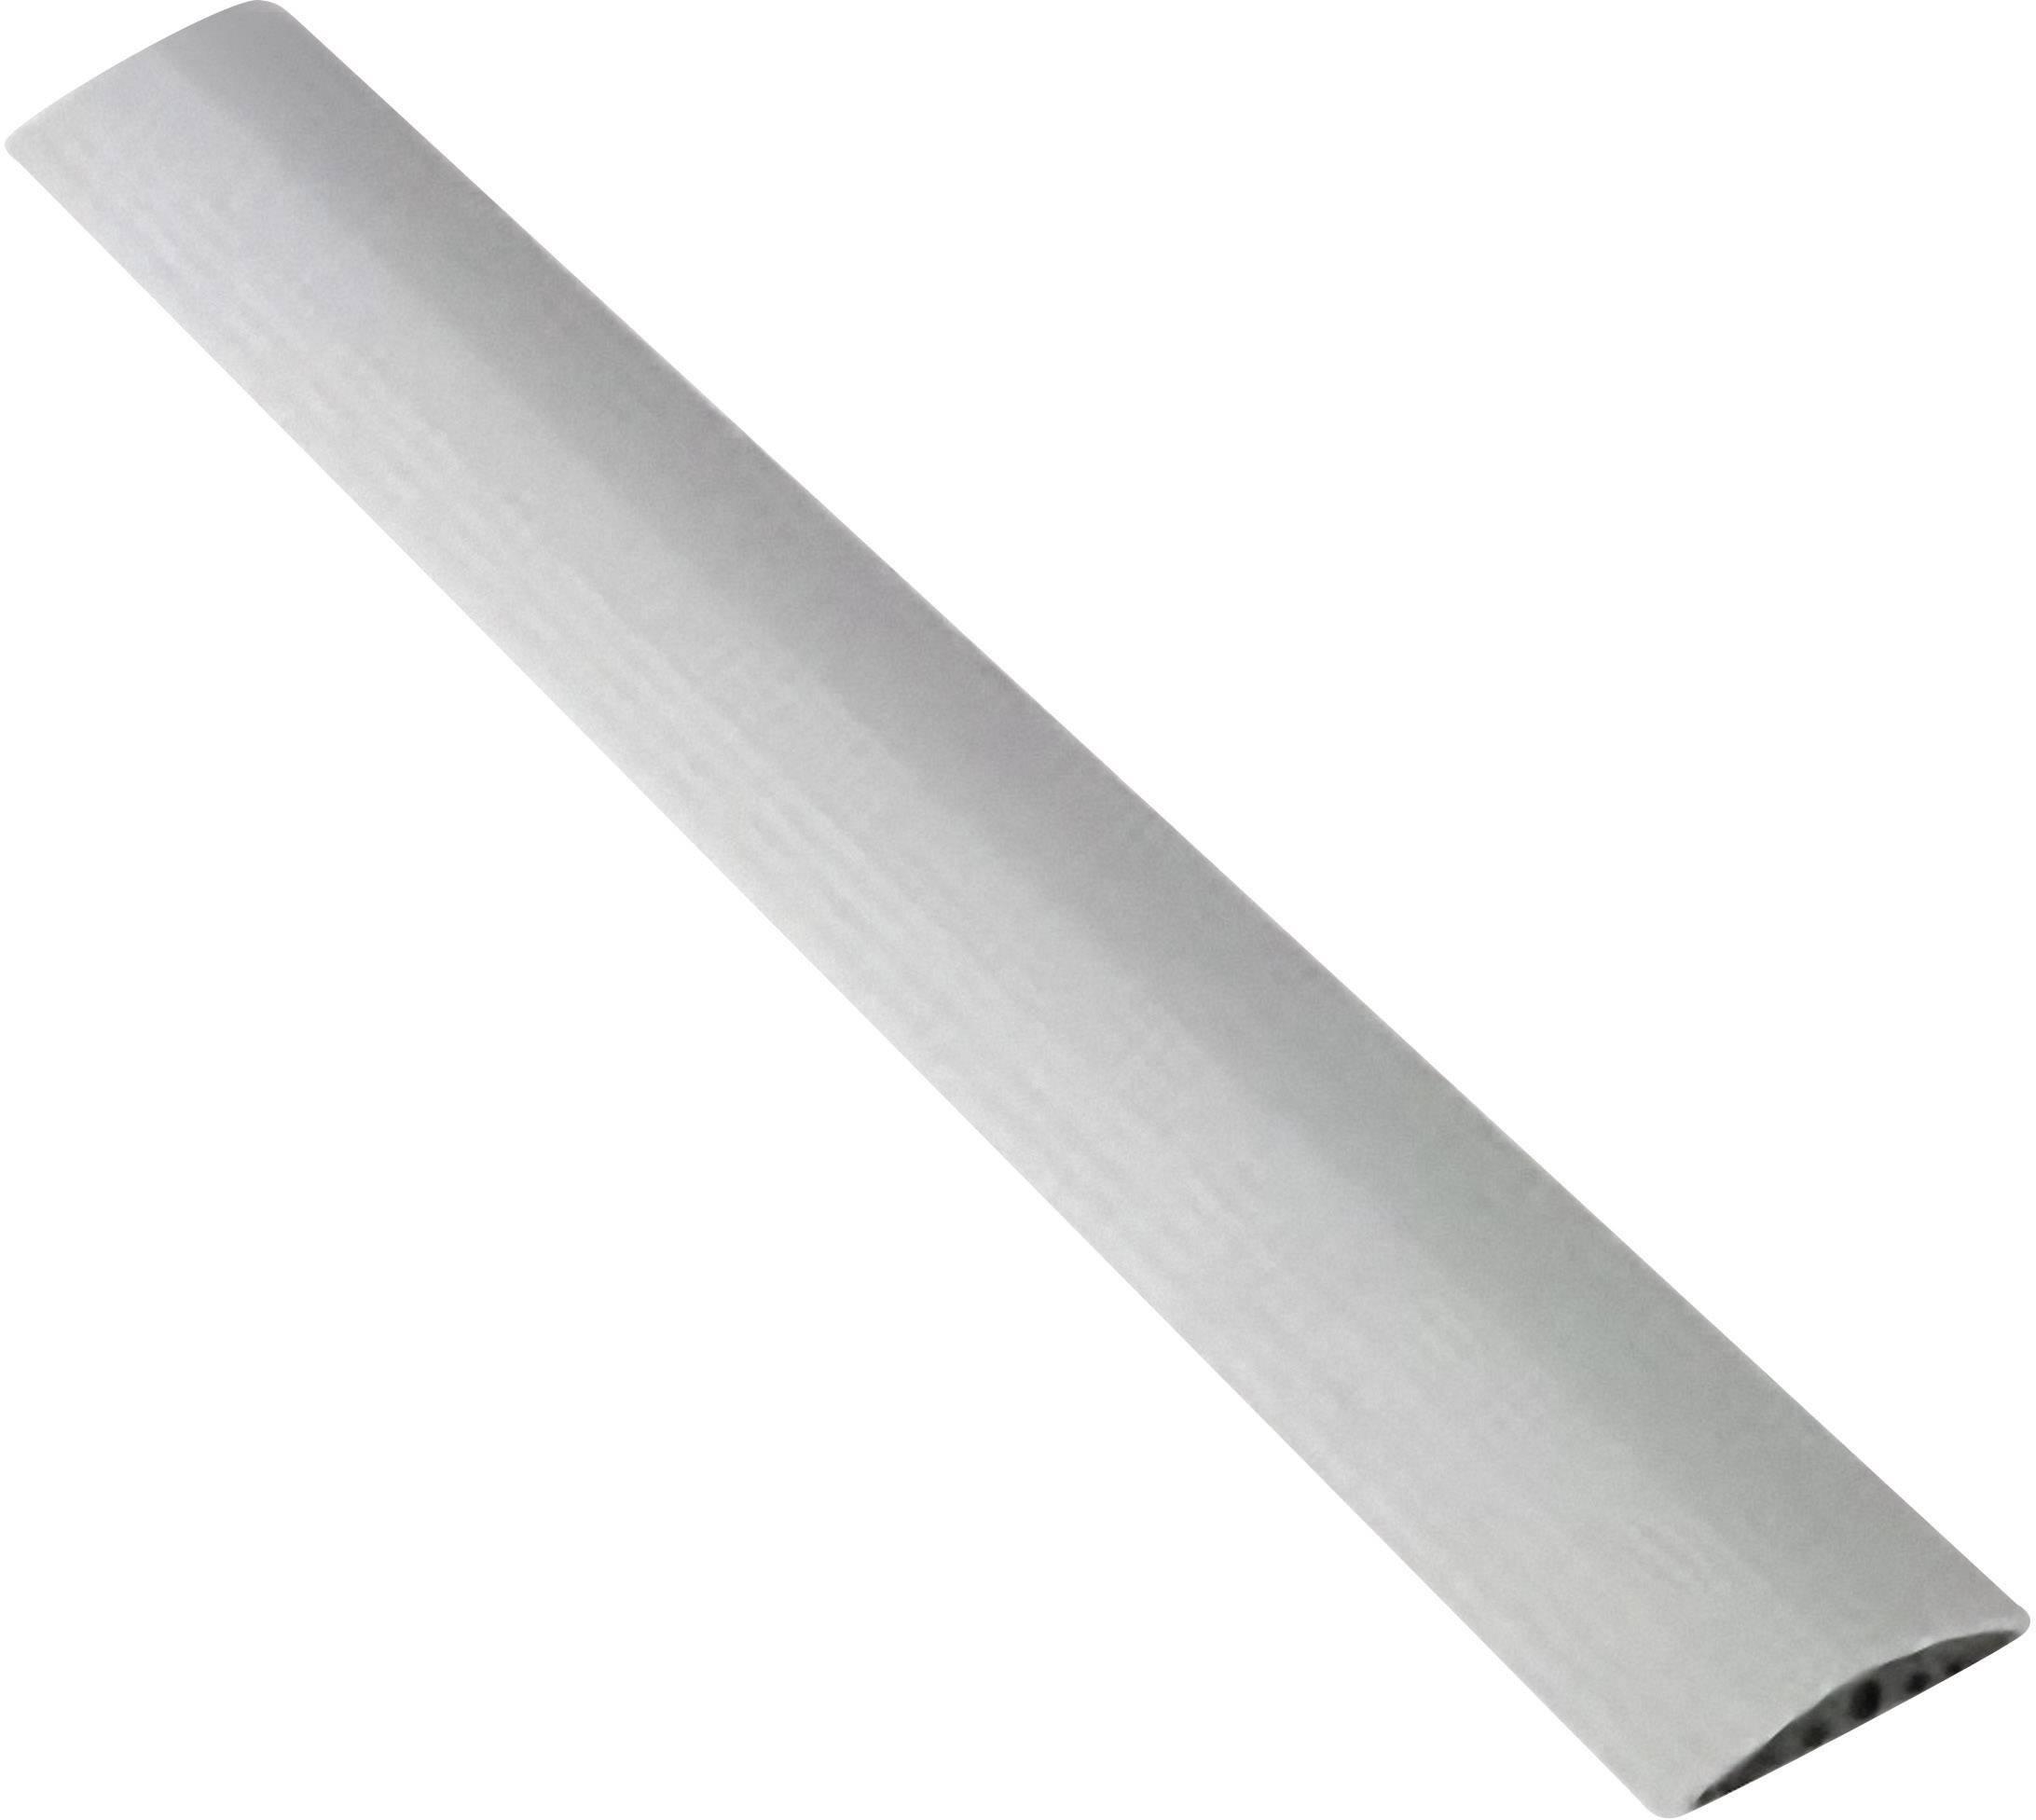 Káblový mostík Serpa 5.01046.7042 B9, (d x š) 3 m x 95 mm, svetlosivá, 1 ks